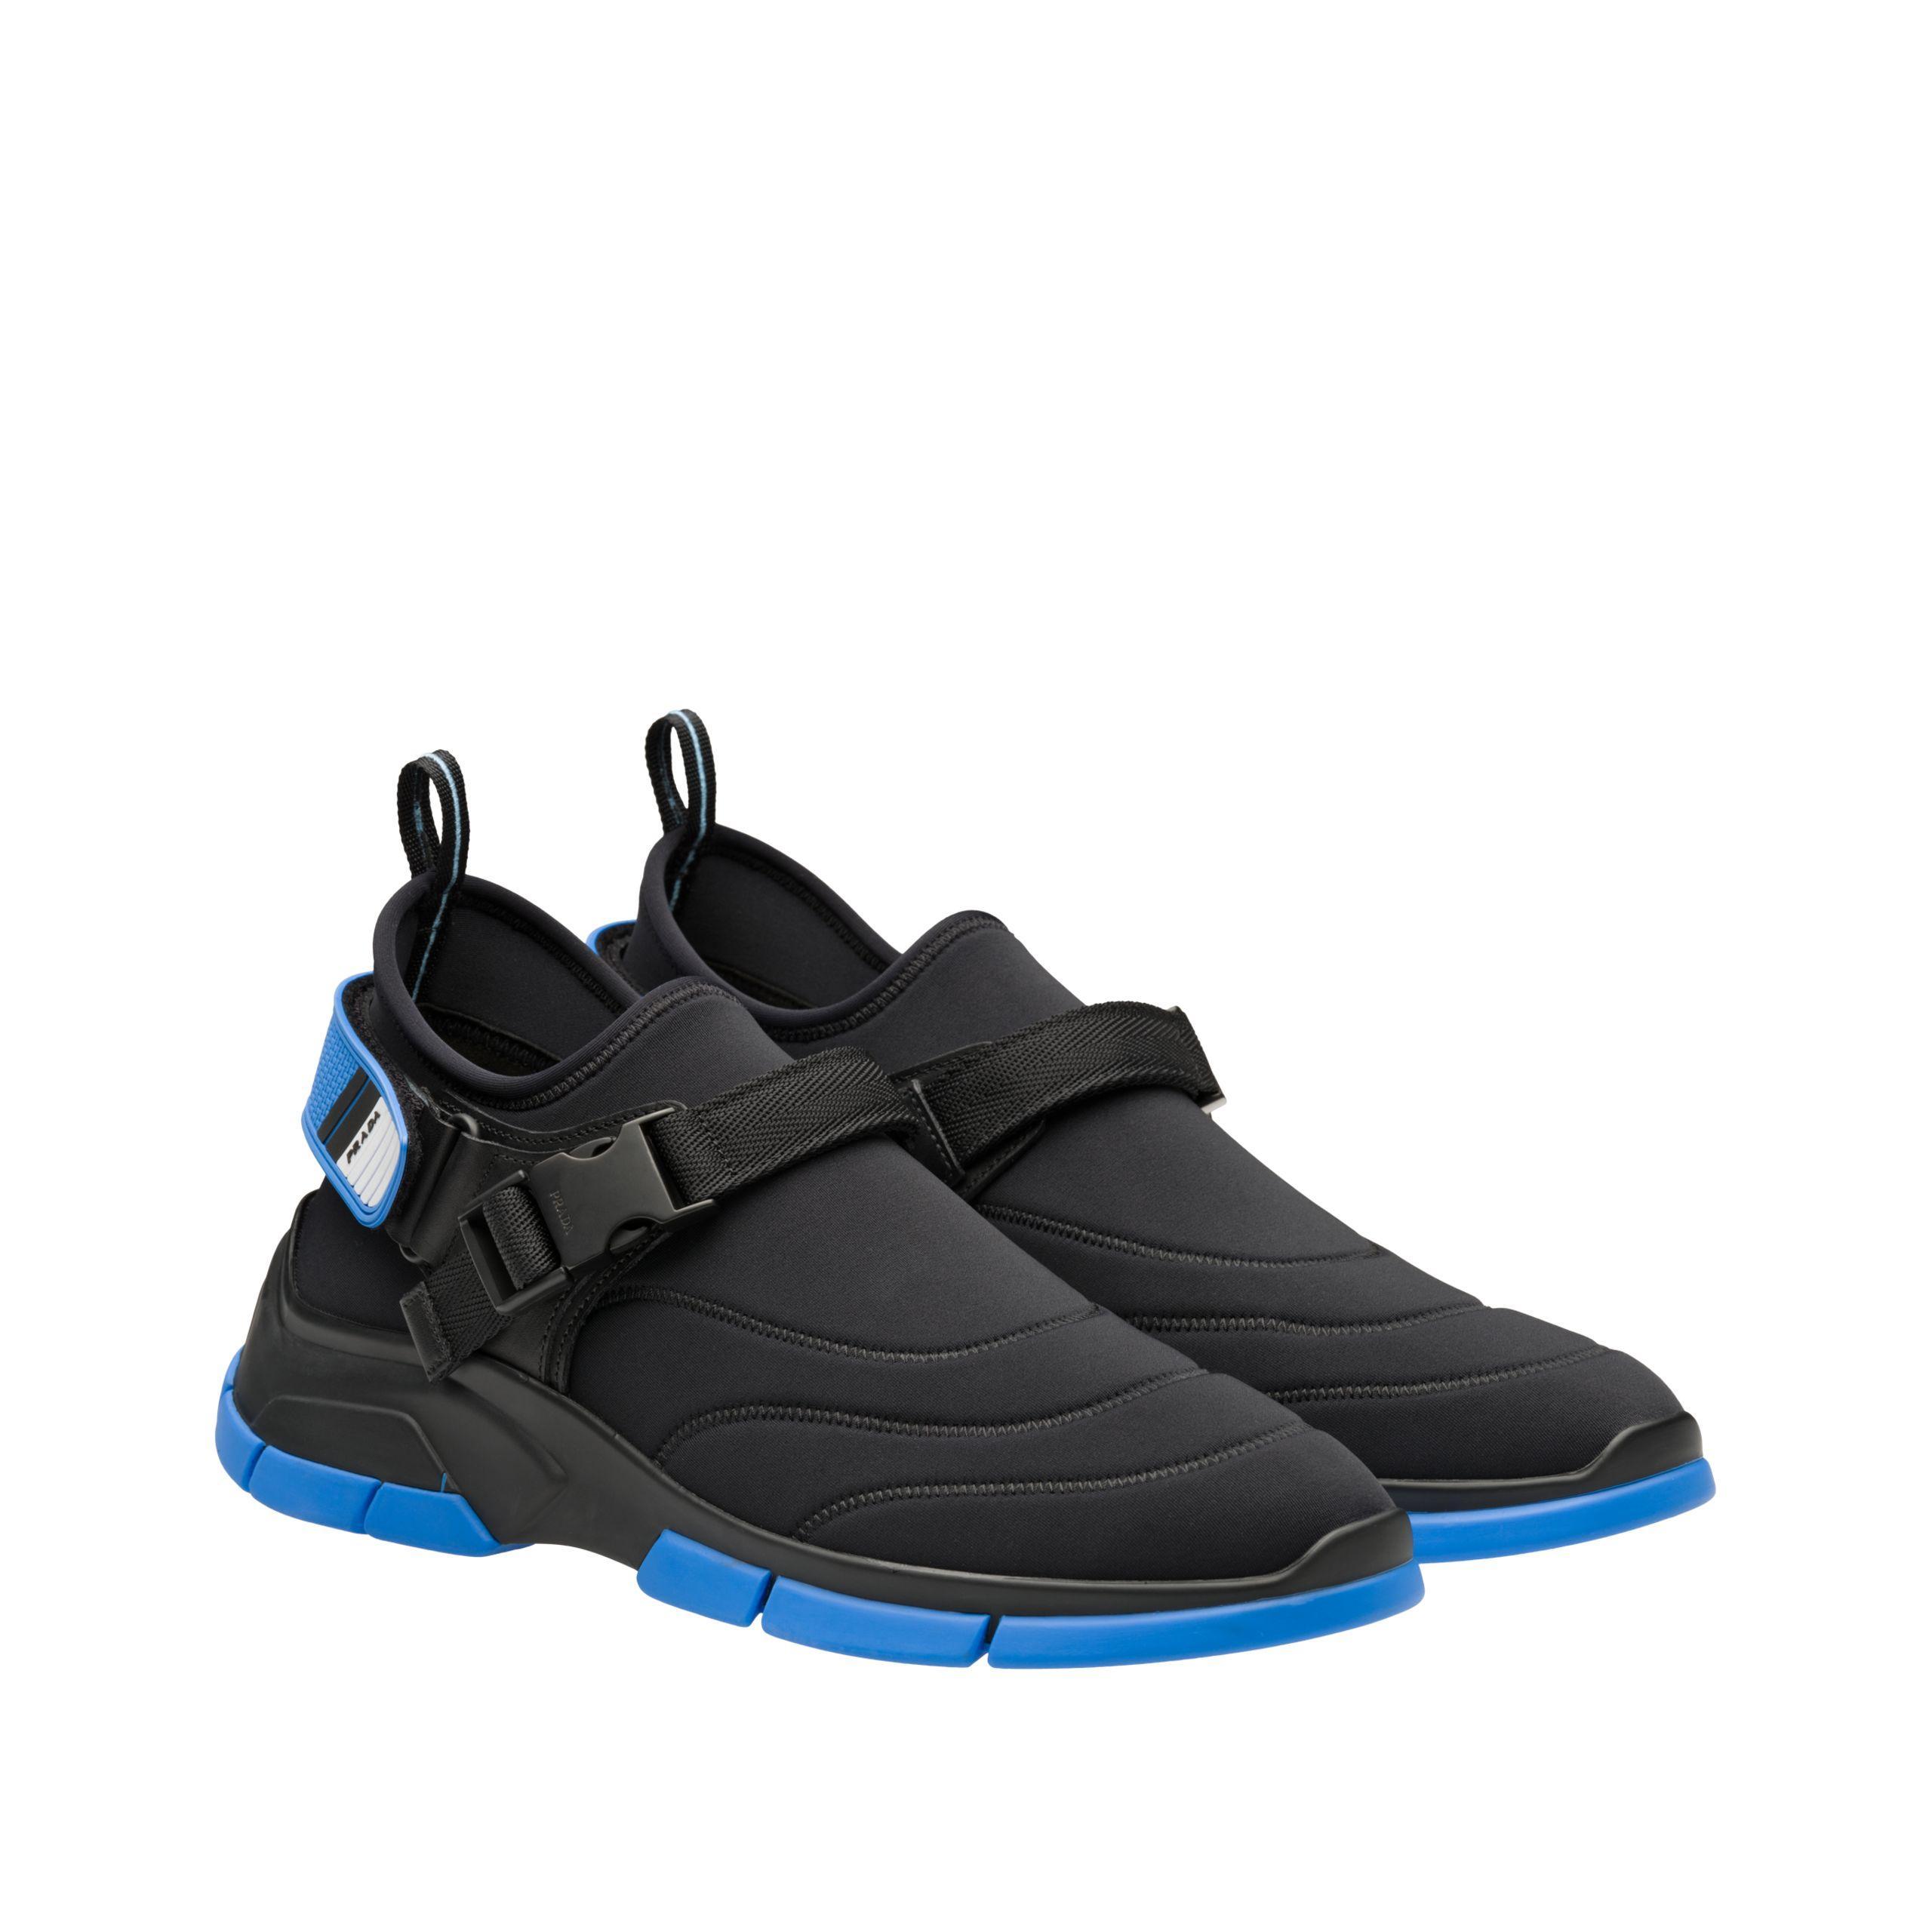 Prada Neoprene Sneakers With Decorative